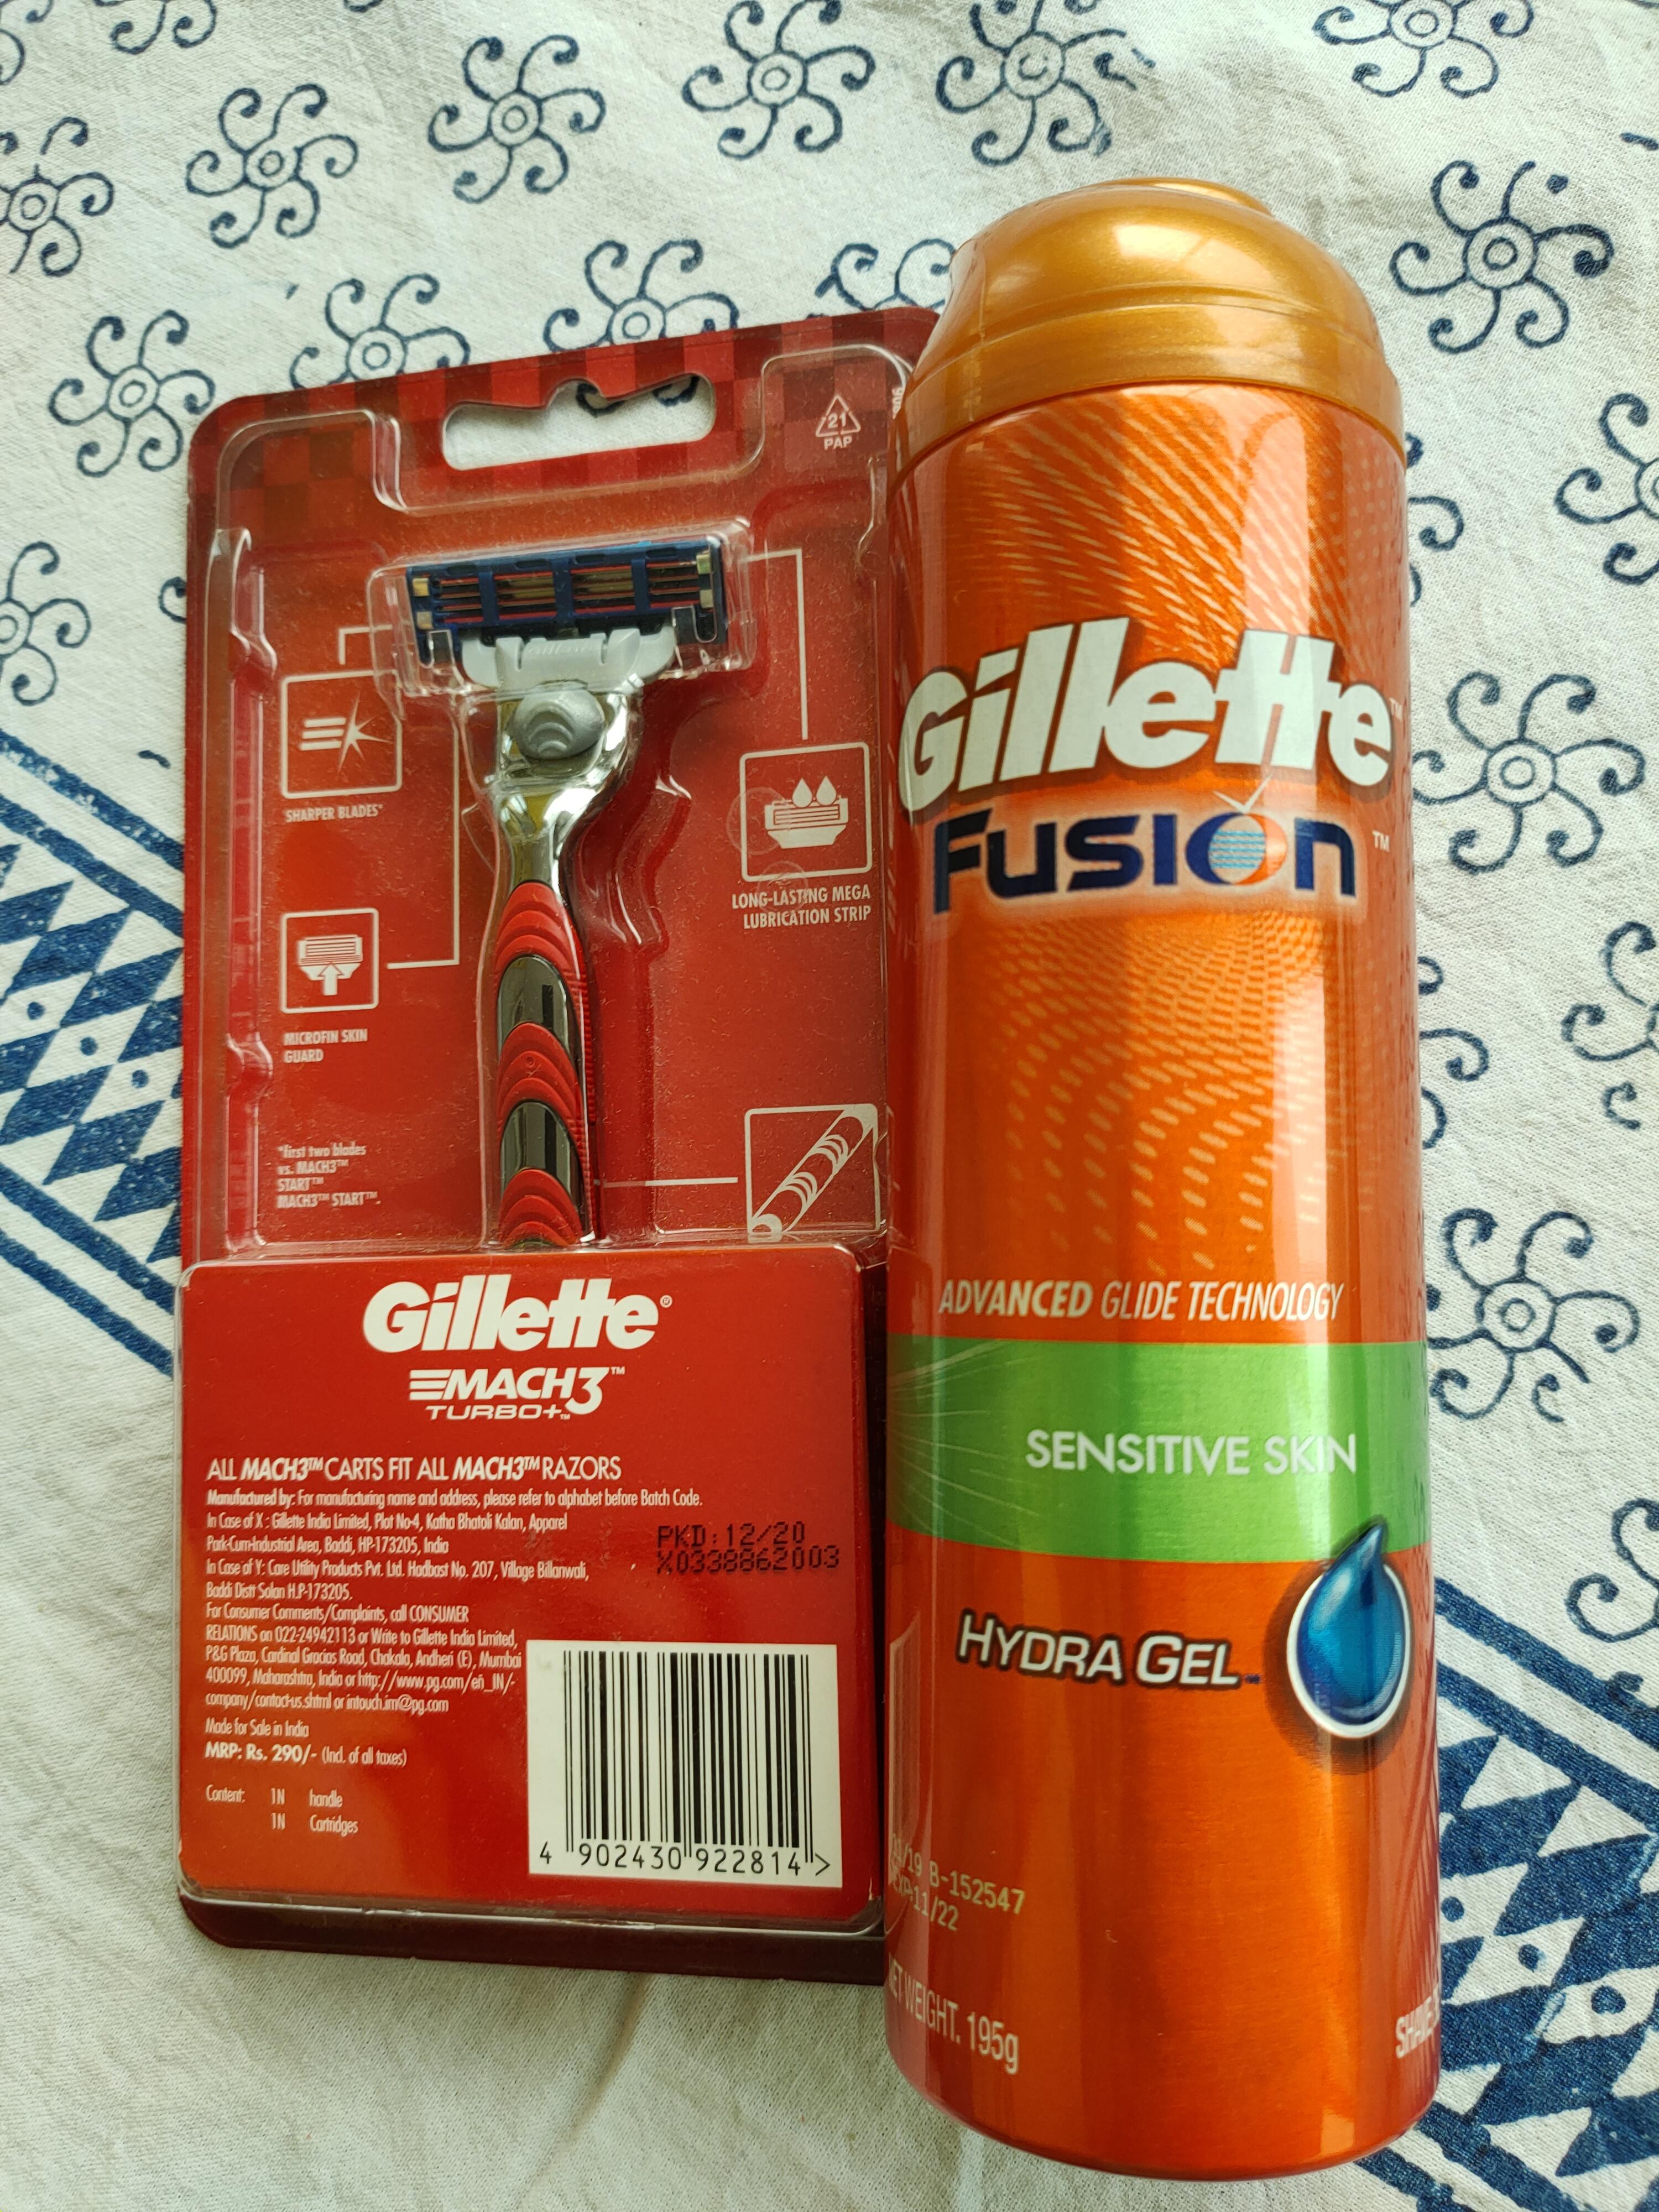 Gillette Fusion Hydra Gel Sensitive Pre Shave Gel-superb shaving product-By manoj_maharana-3